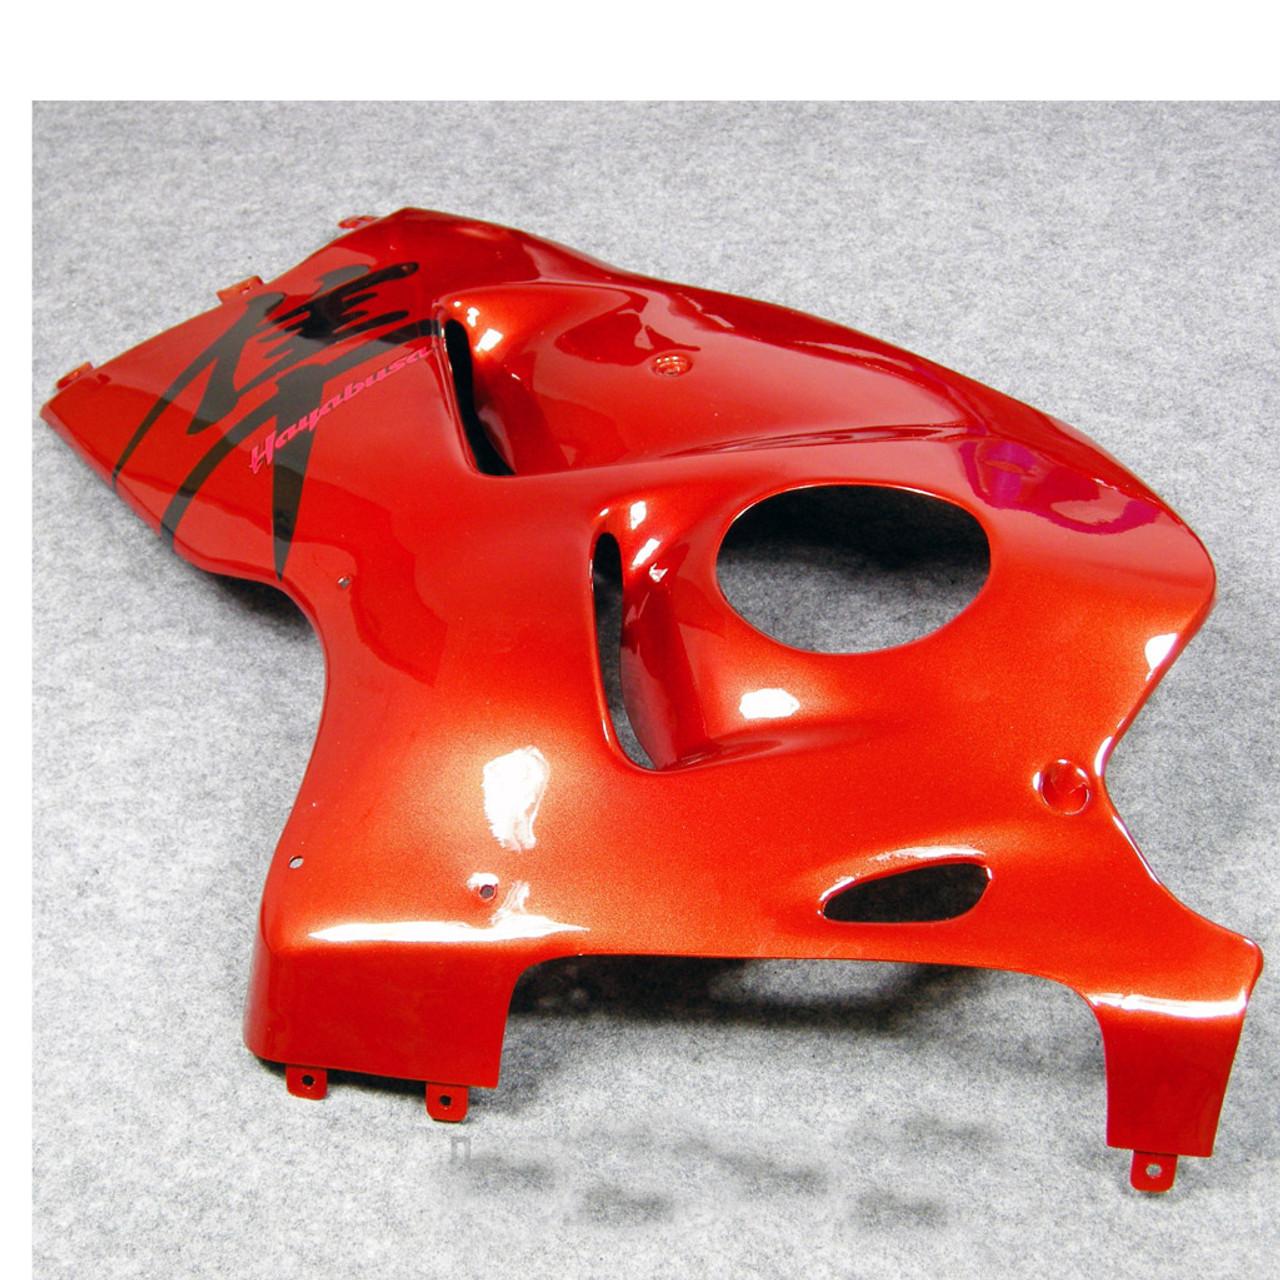 Fairings Suzuki GSX1300 Hayabusa Orange Metallic Hayabusa Racing  (1999-2007)